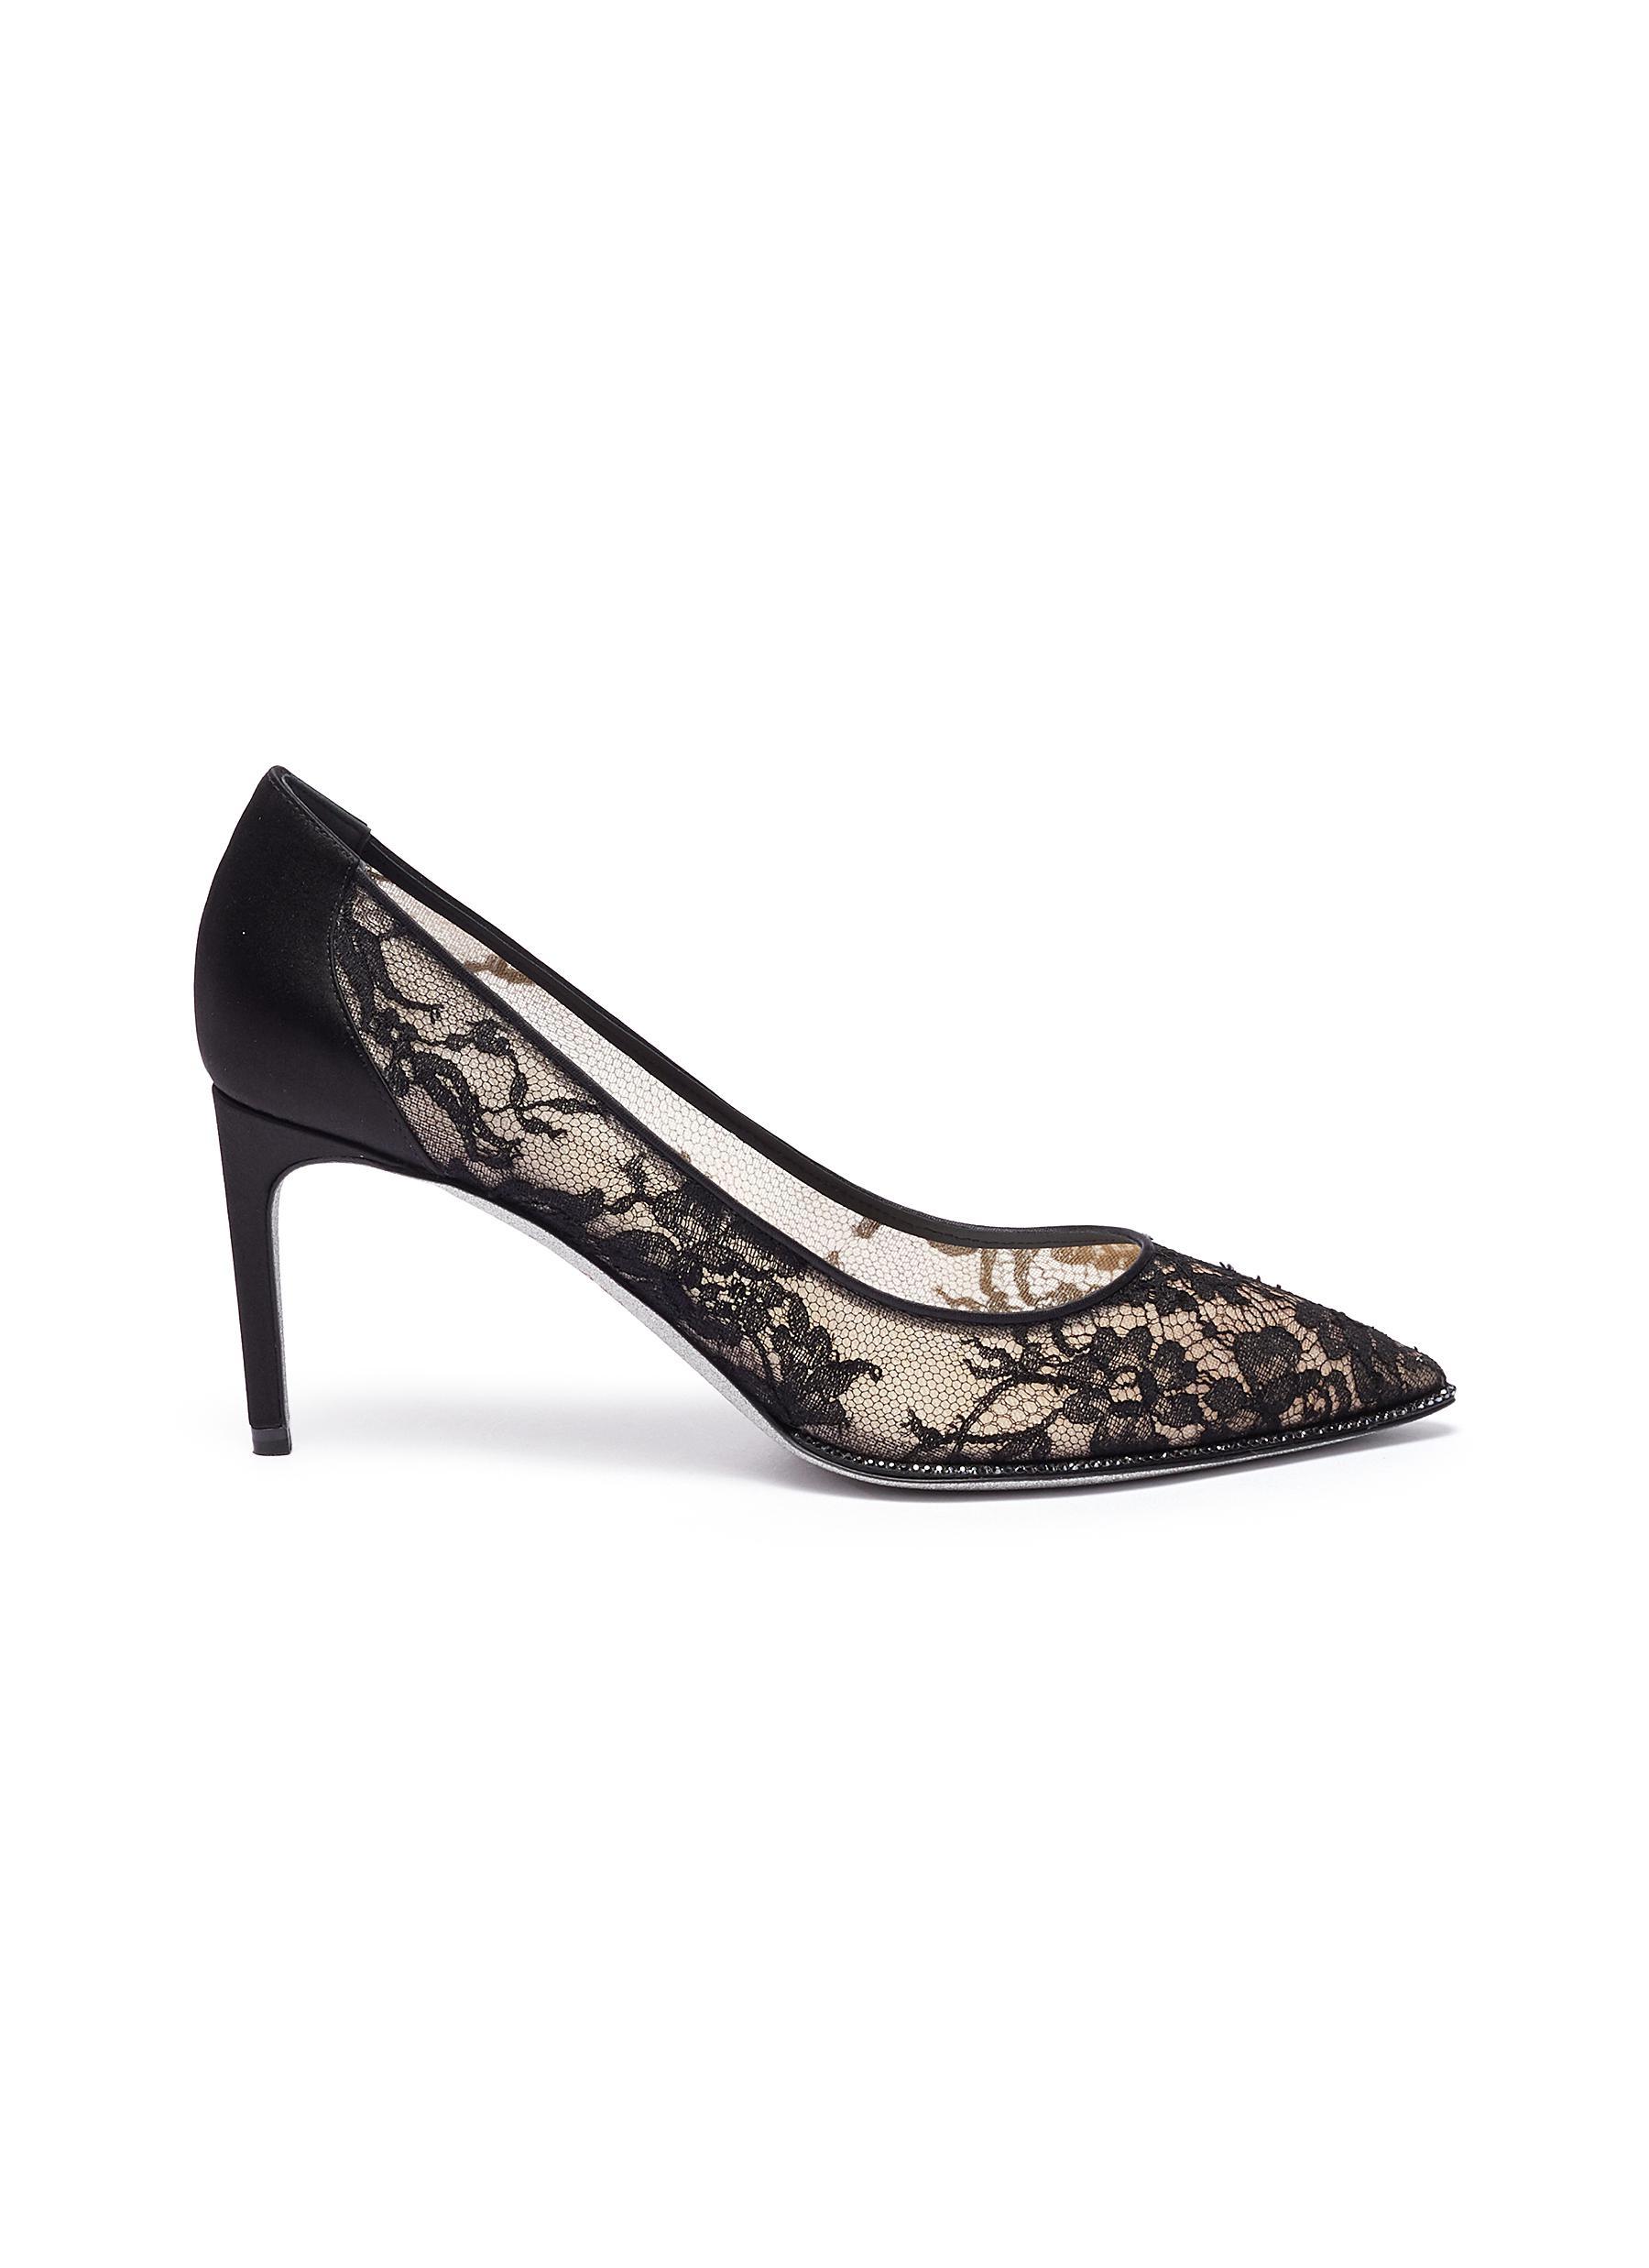 René Caovilla High Heels Hematite strass lace pumps